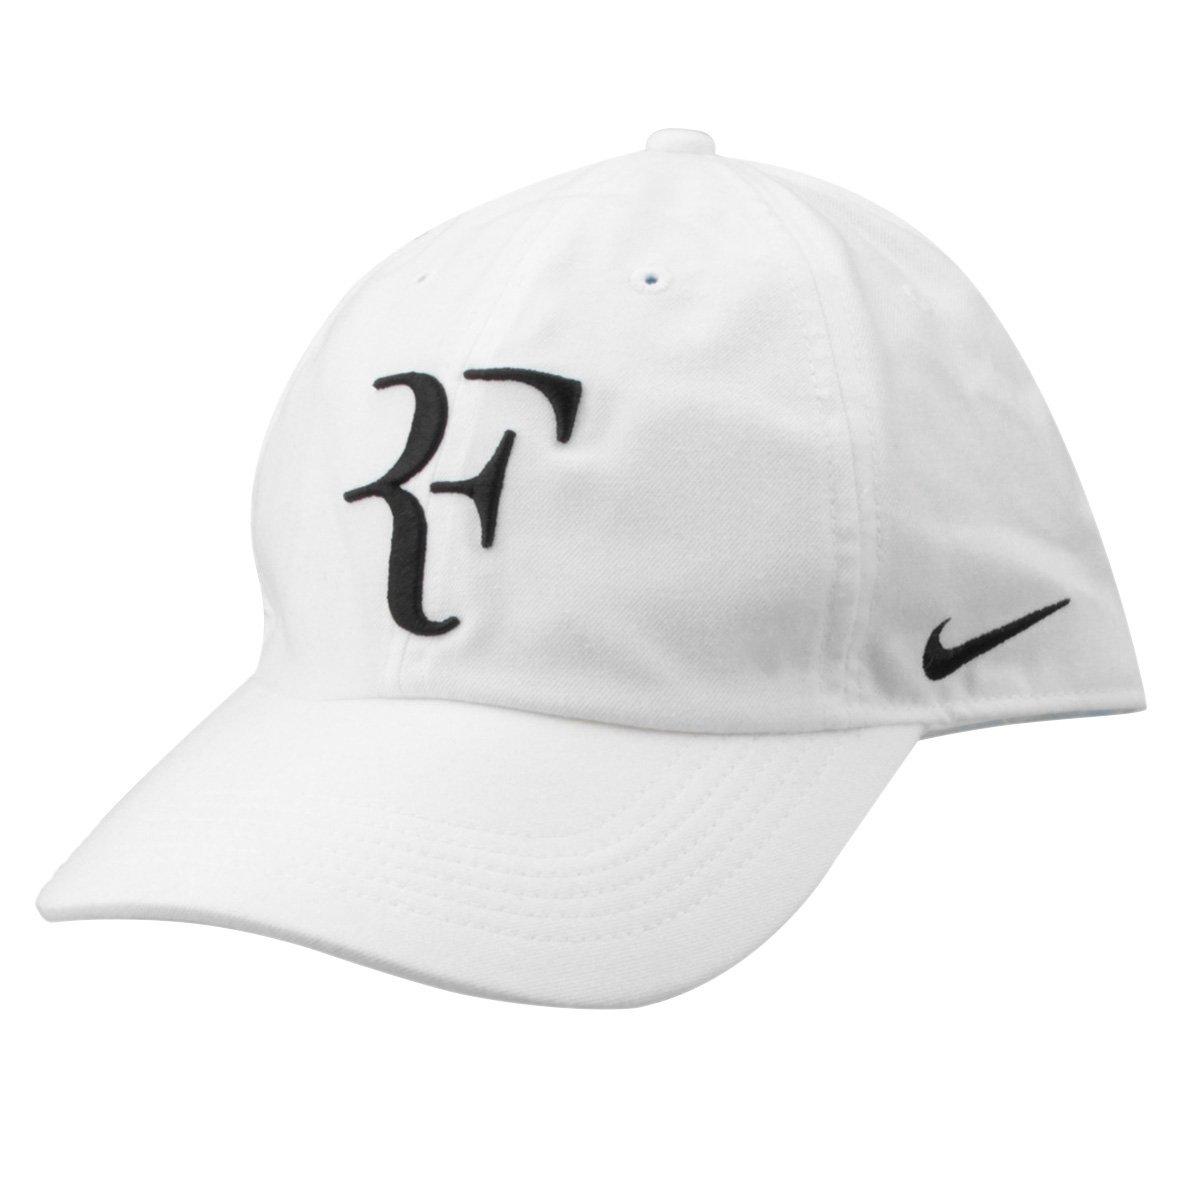 Compre Acessorios Dos Tennis da Raquel Calcados Online  b0d2edf8d3b